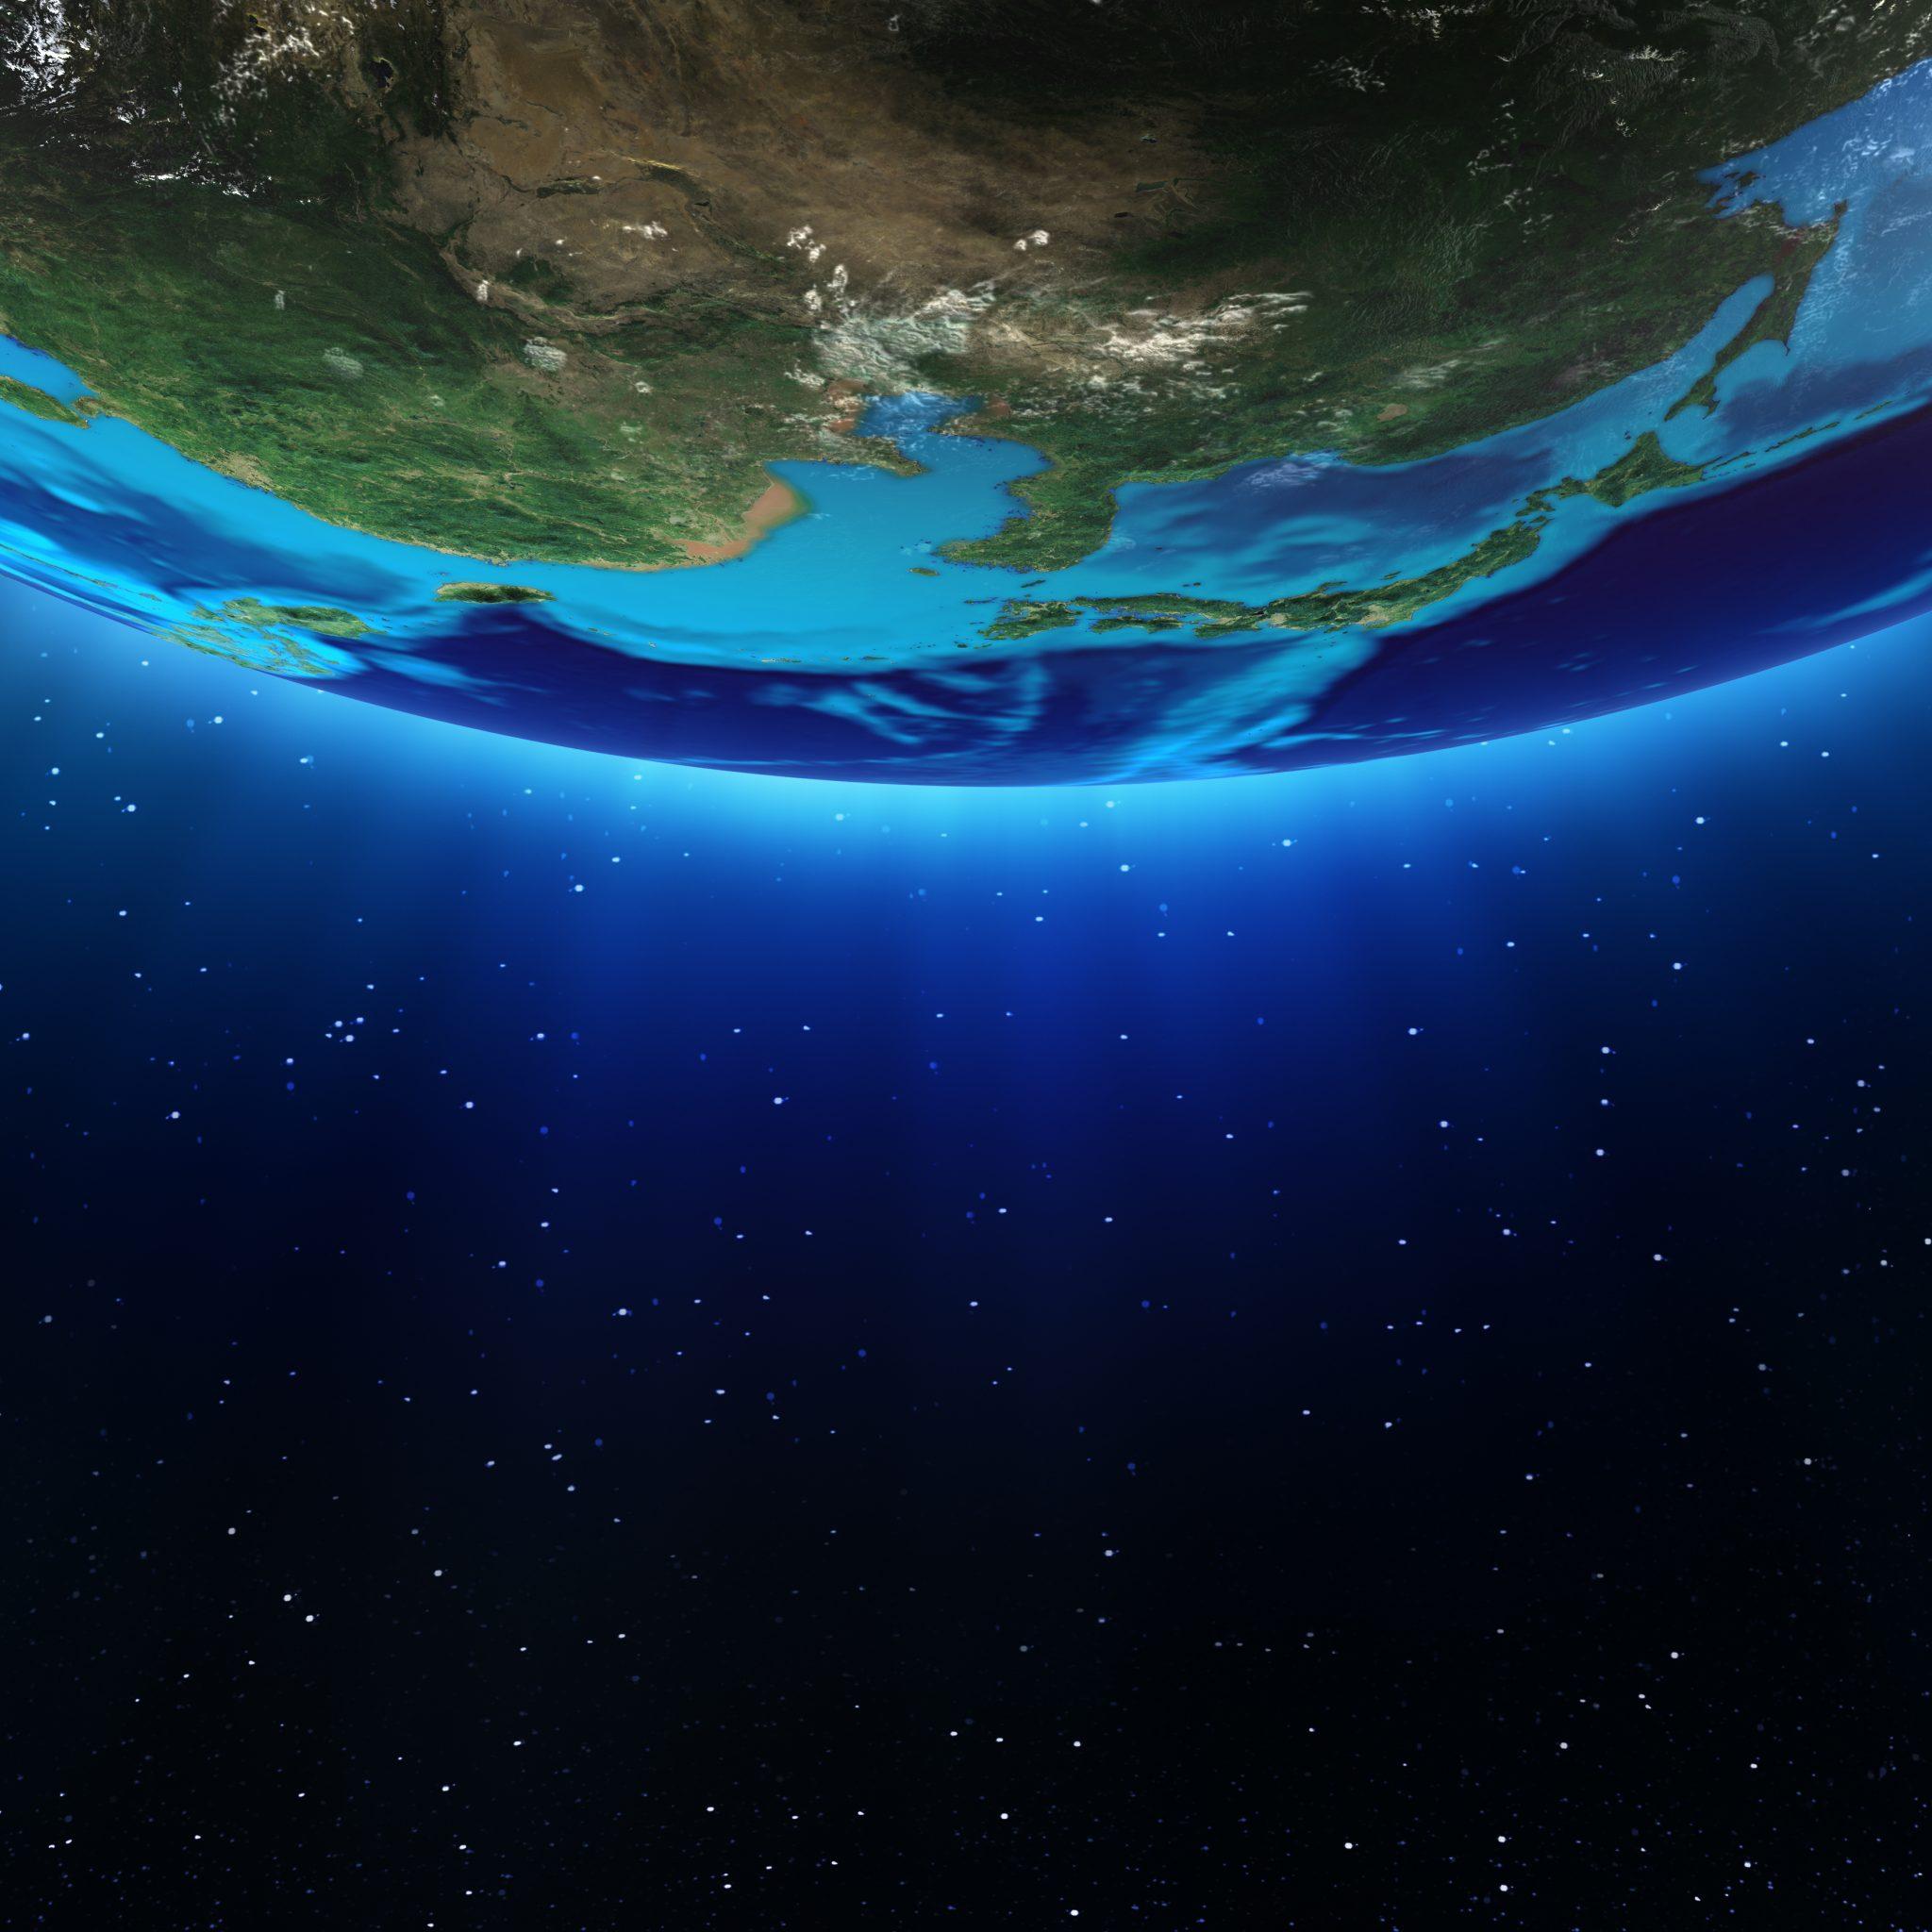 COLOURBOX8370817 Planet